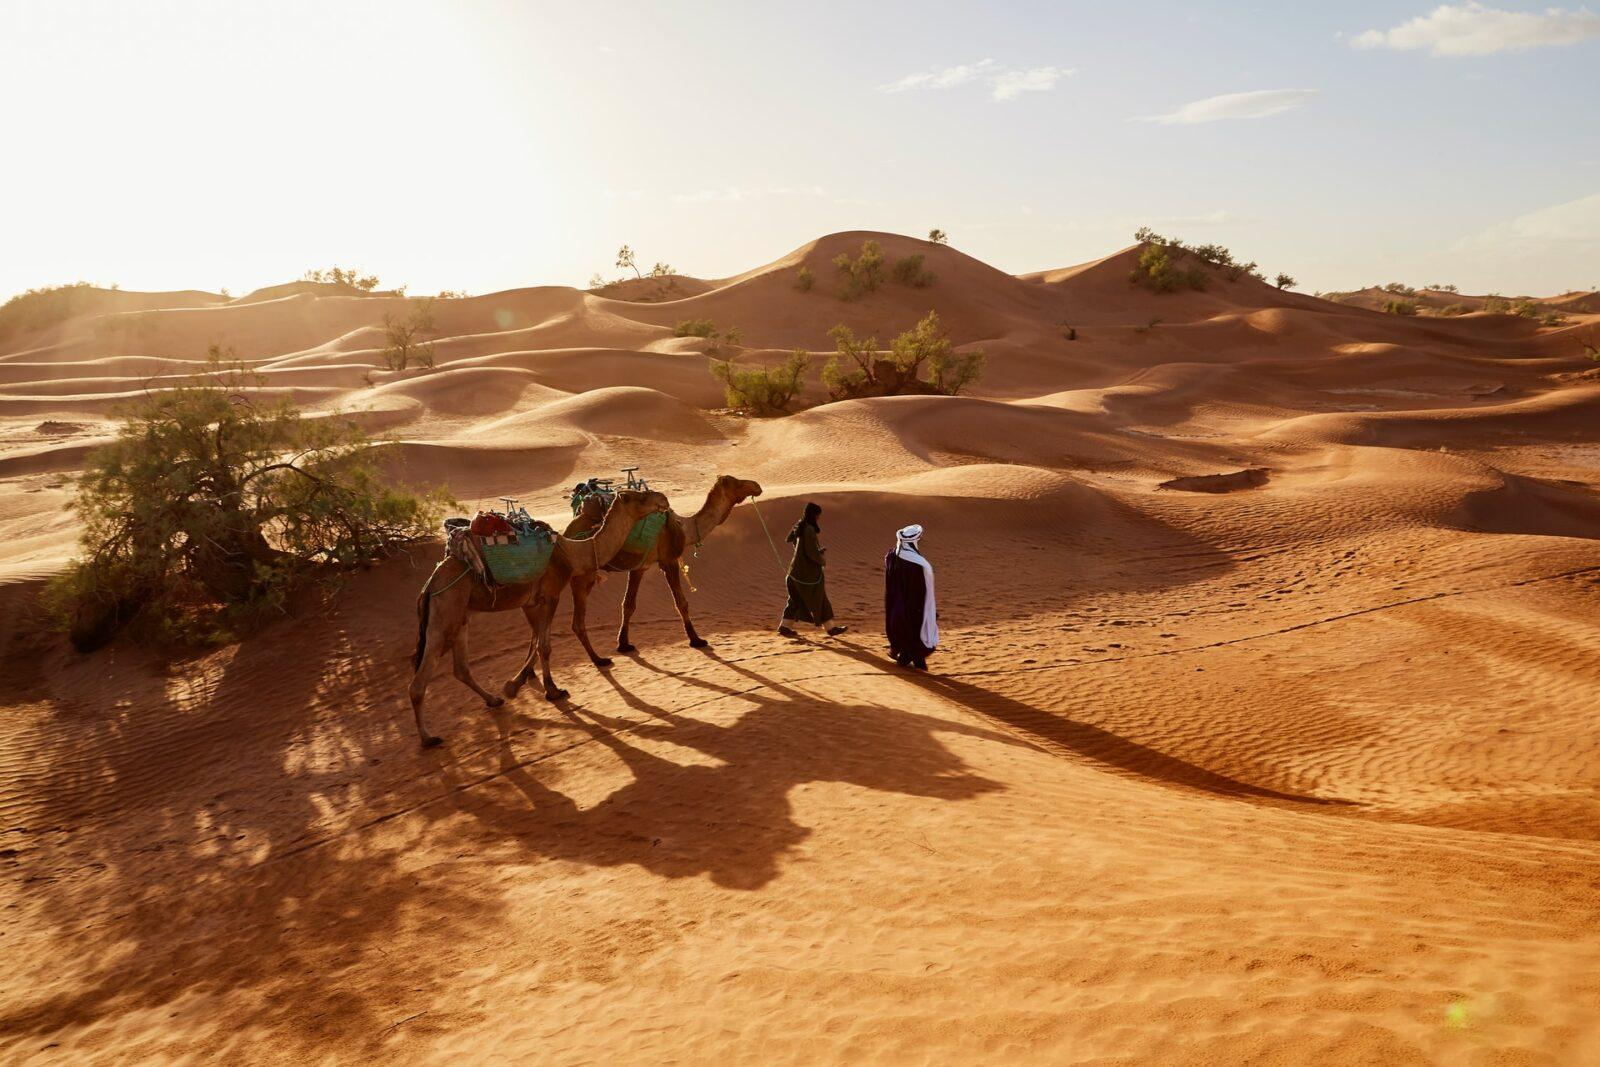 fabien bazanegue dA kSCn0K20 unsplash 1536x1024 - Guide Morocco Tours